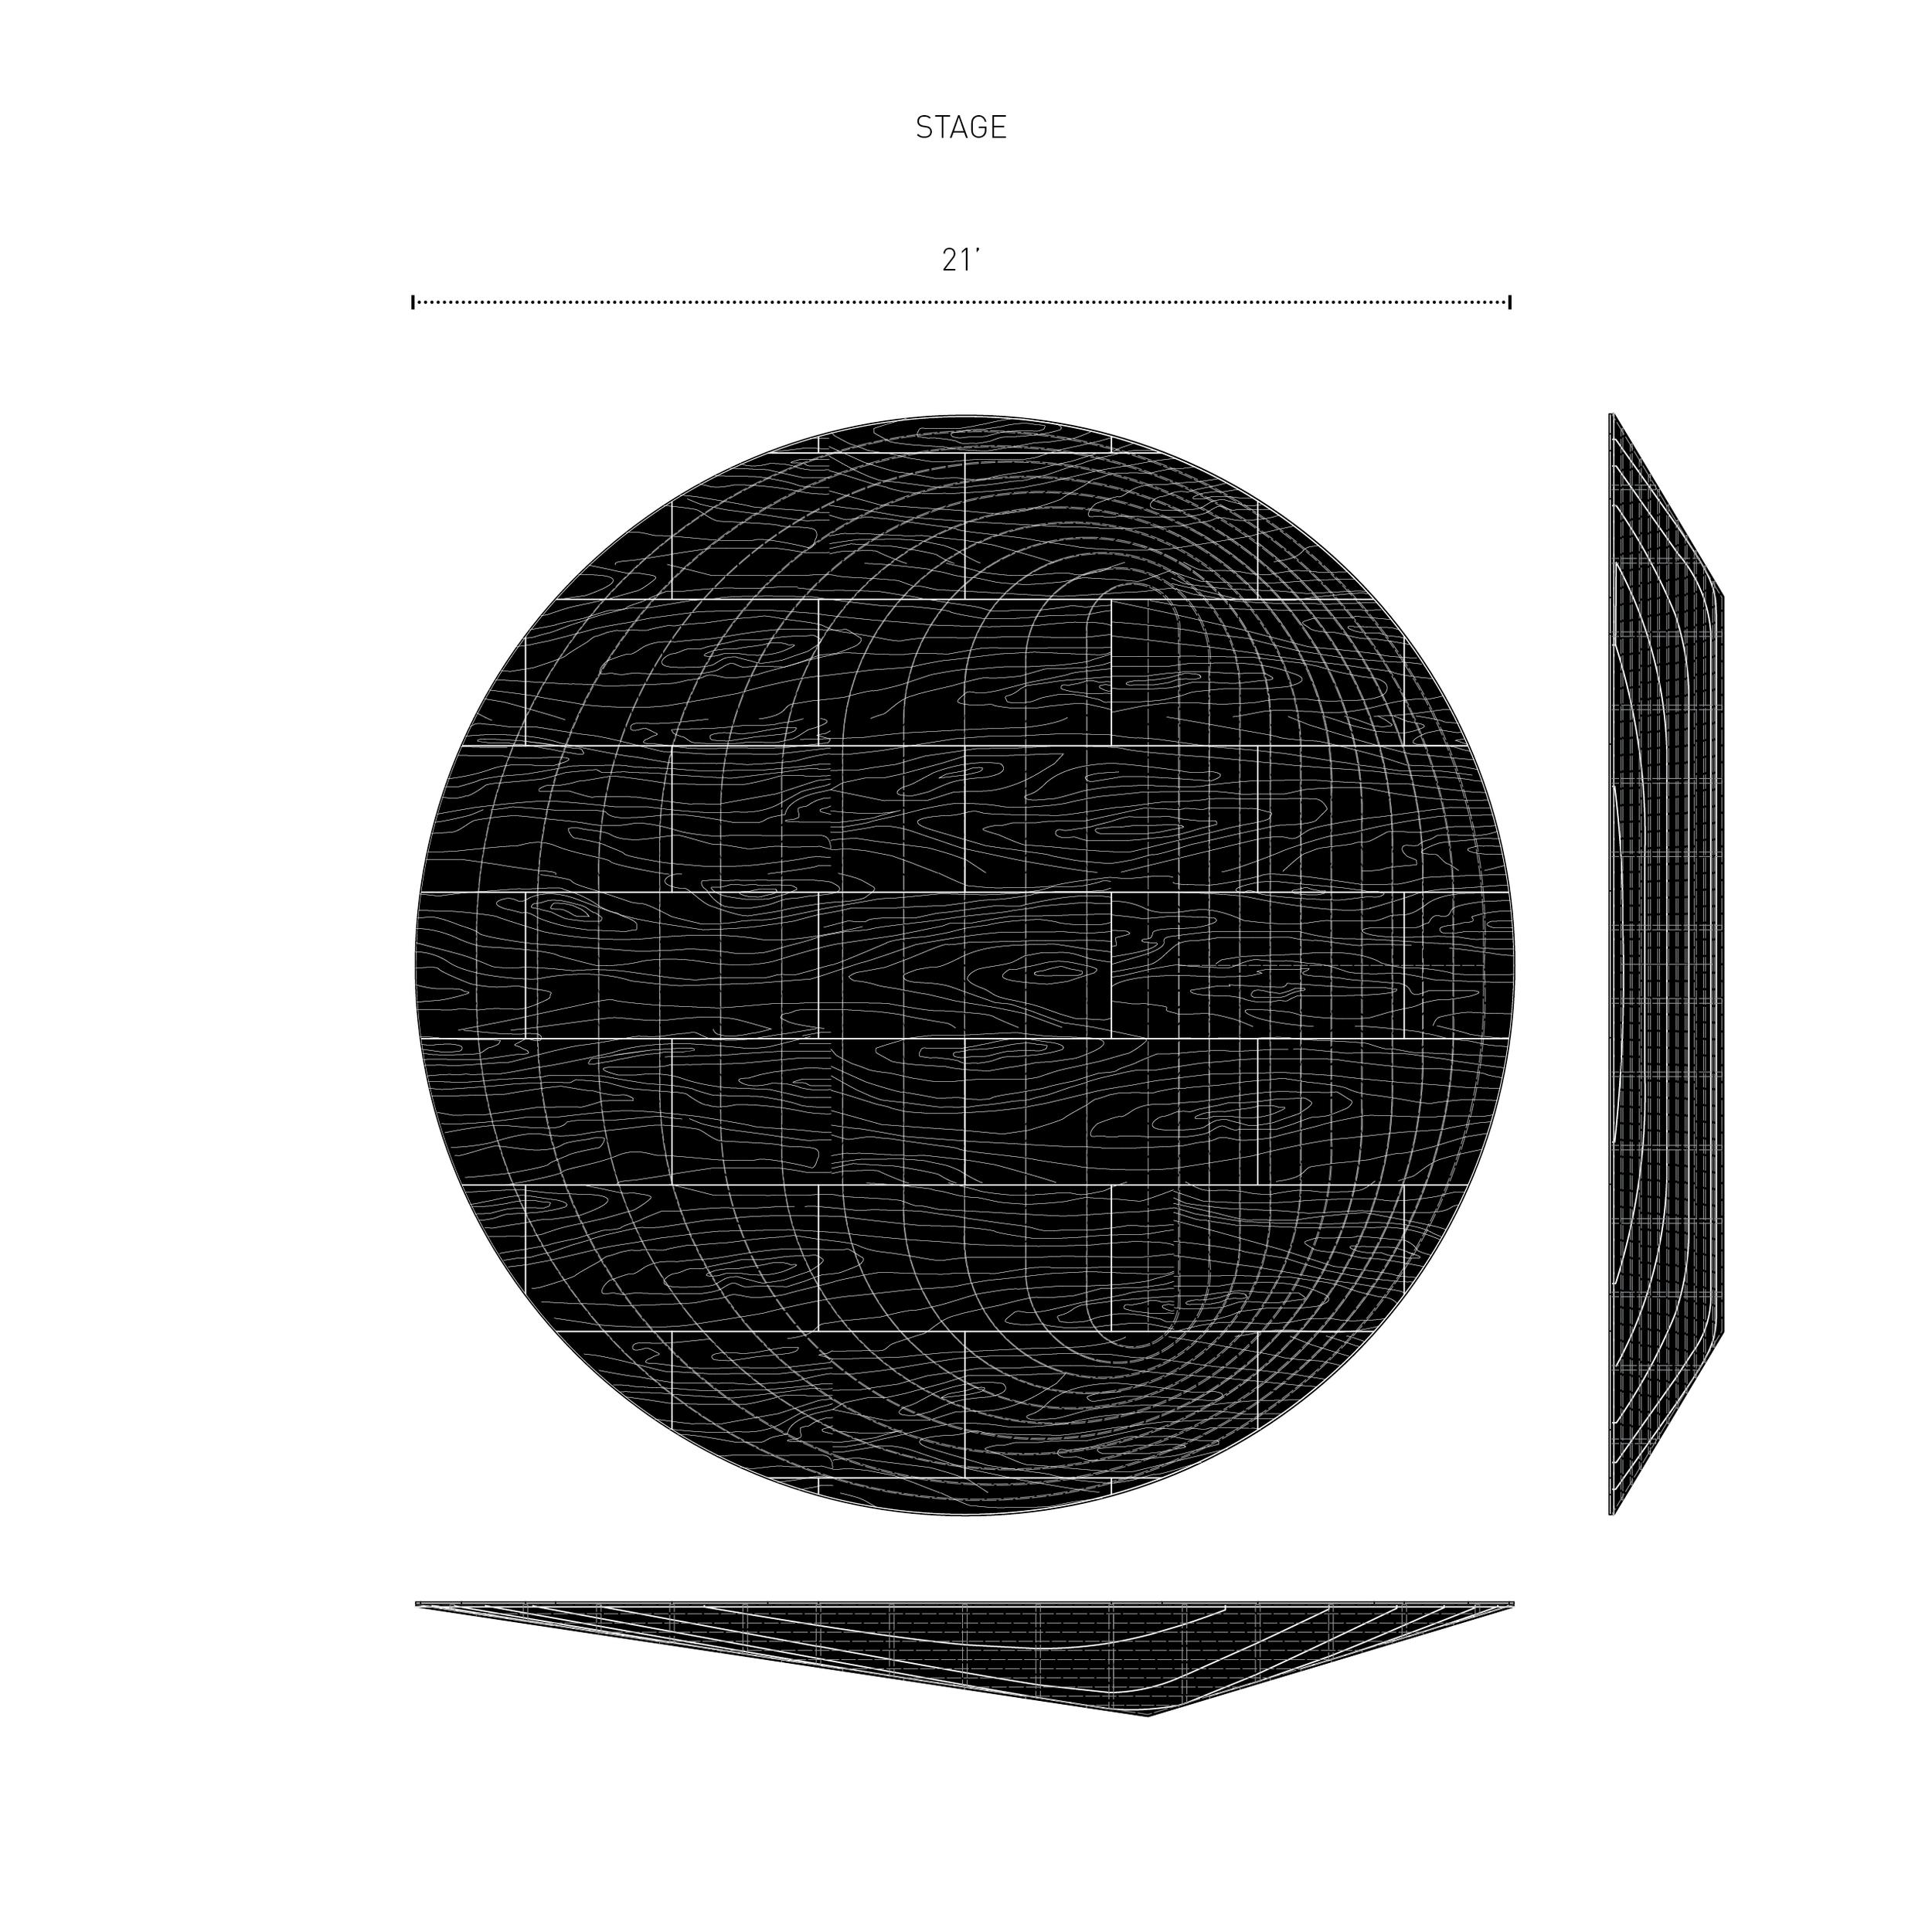 2019_Ragdale Ring_Web Material5.png